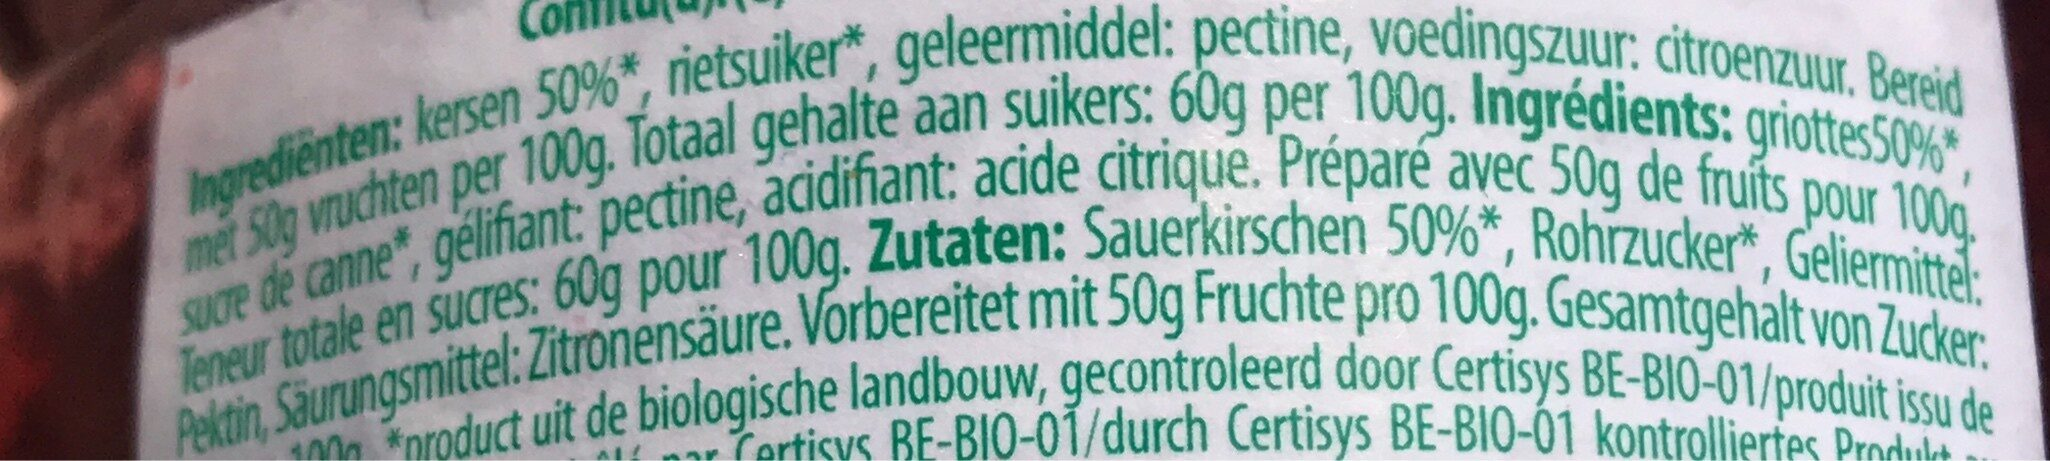 Confiture griottes - Ingrediënten